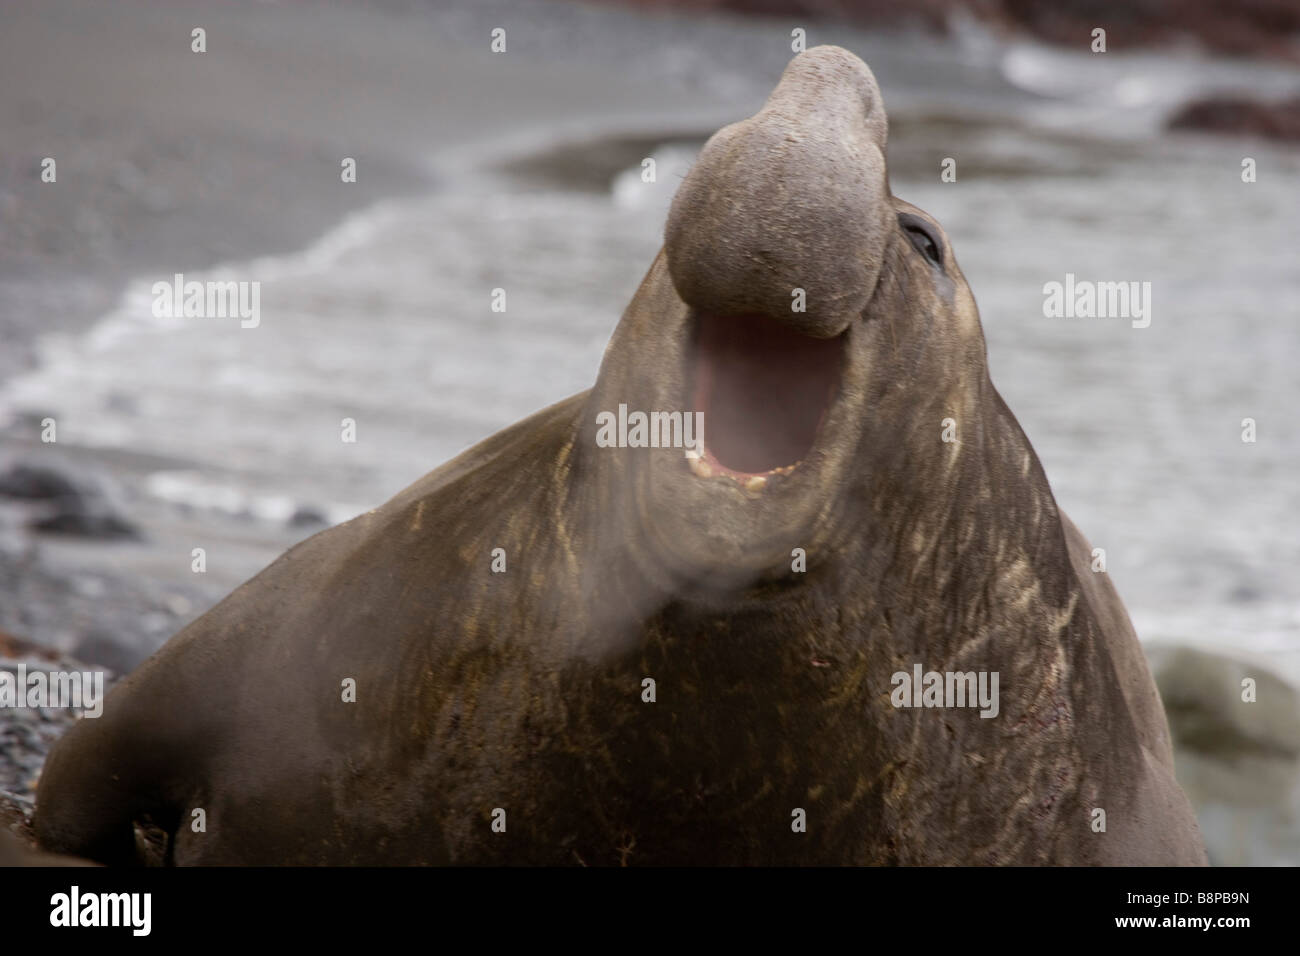 South Georgia Island Southern, UK - Elephant Seal, Mirounga leoina - Stock Image